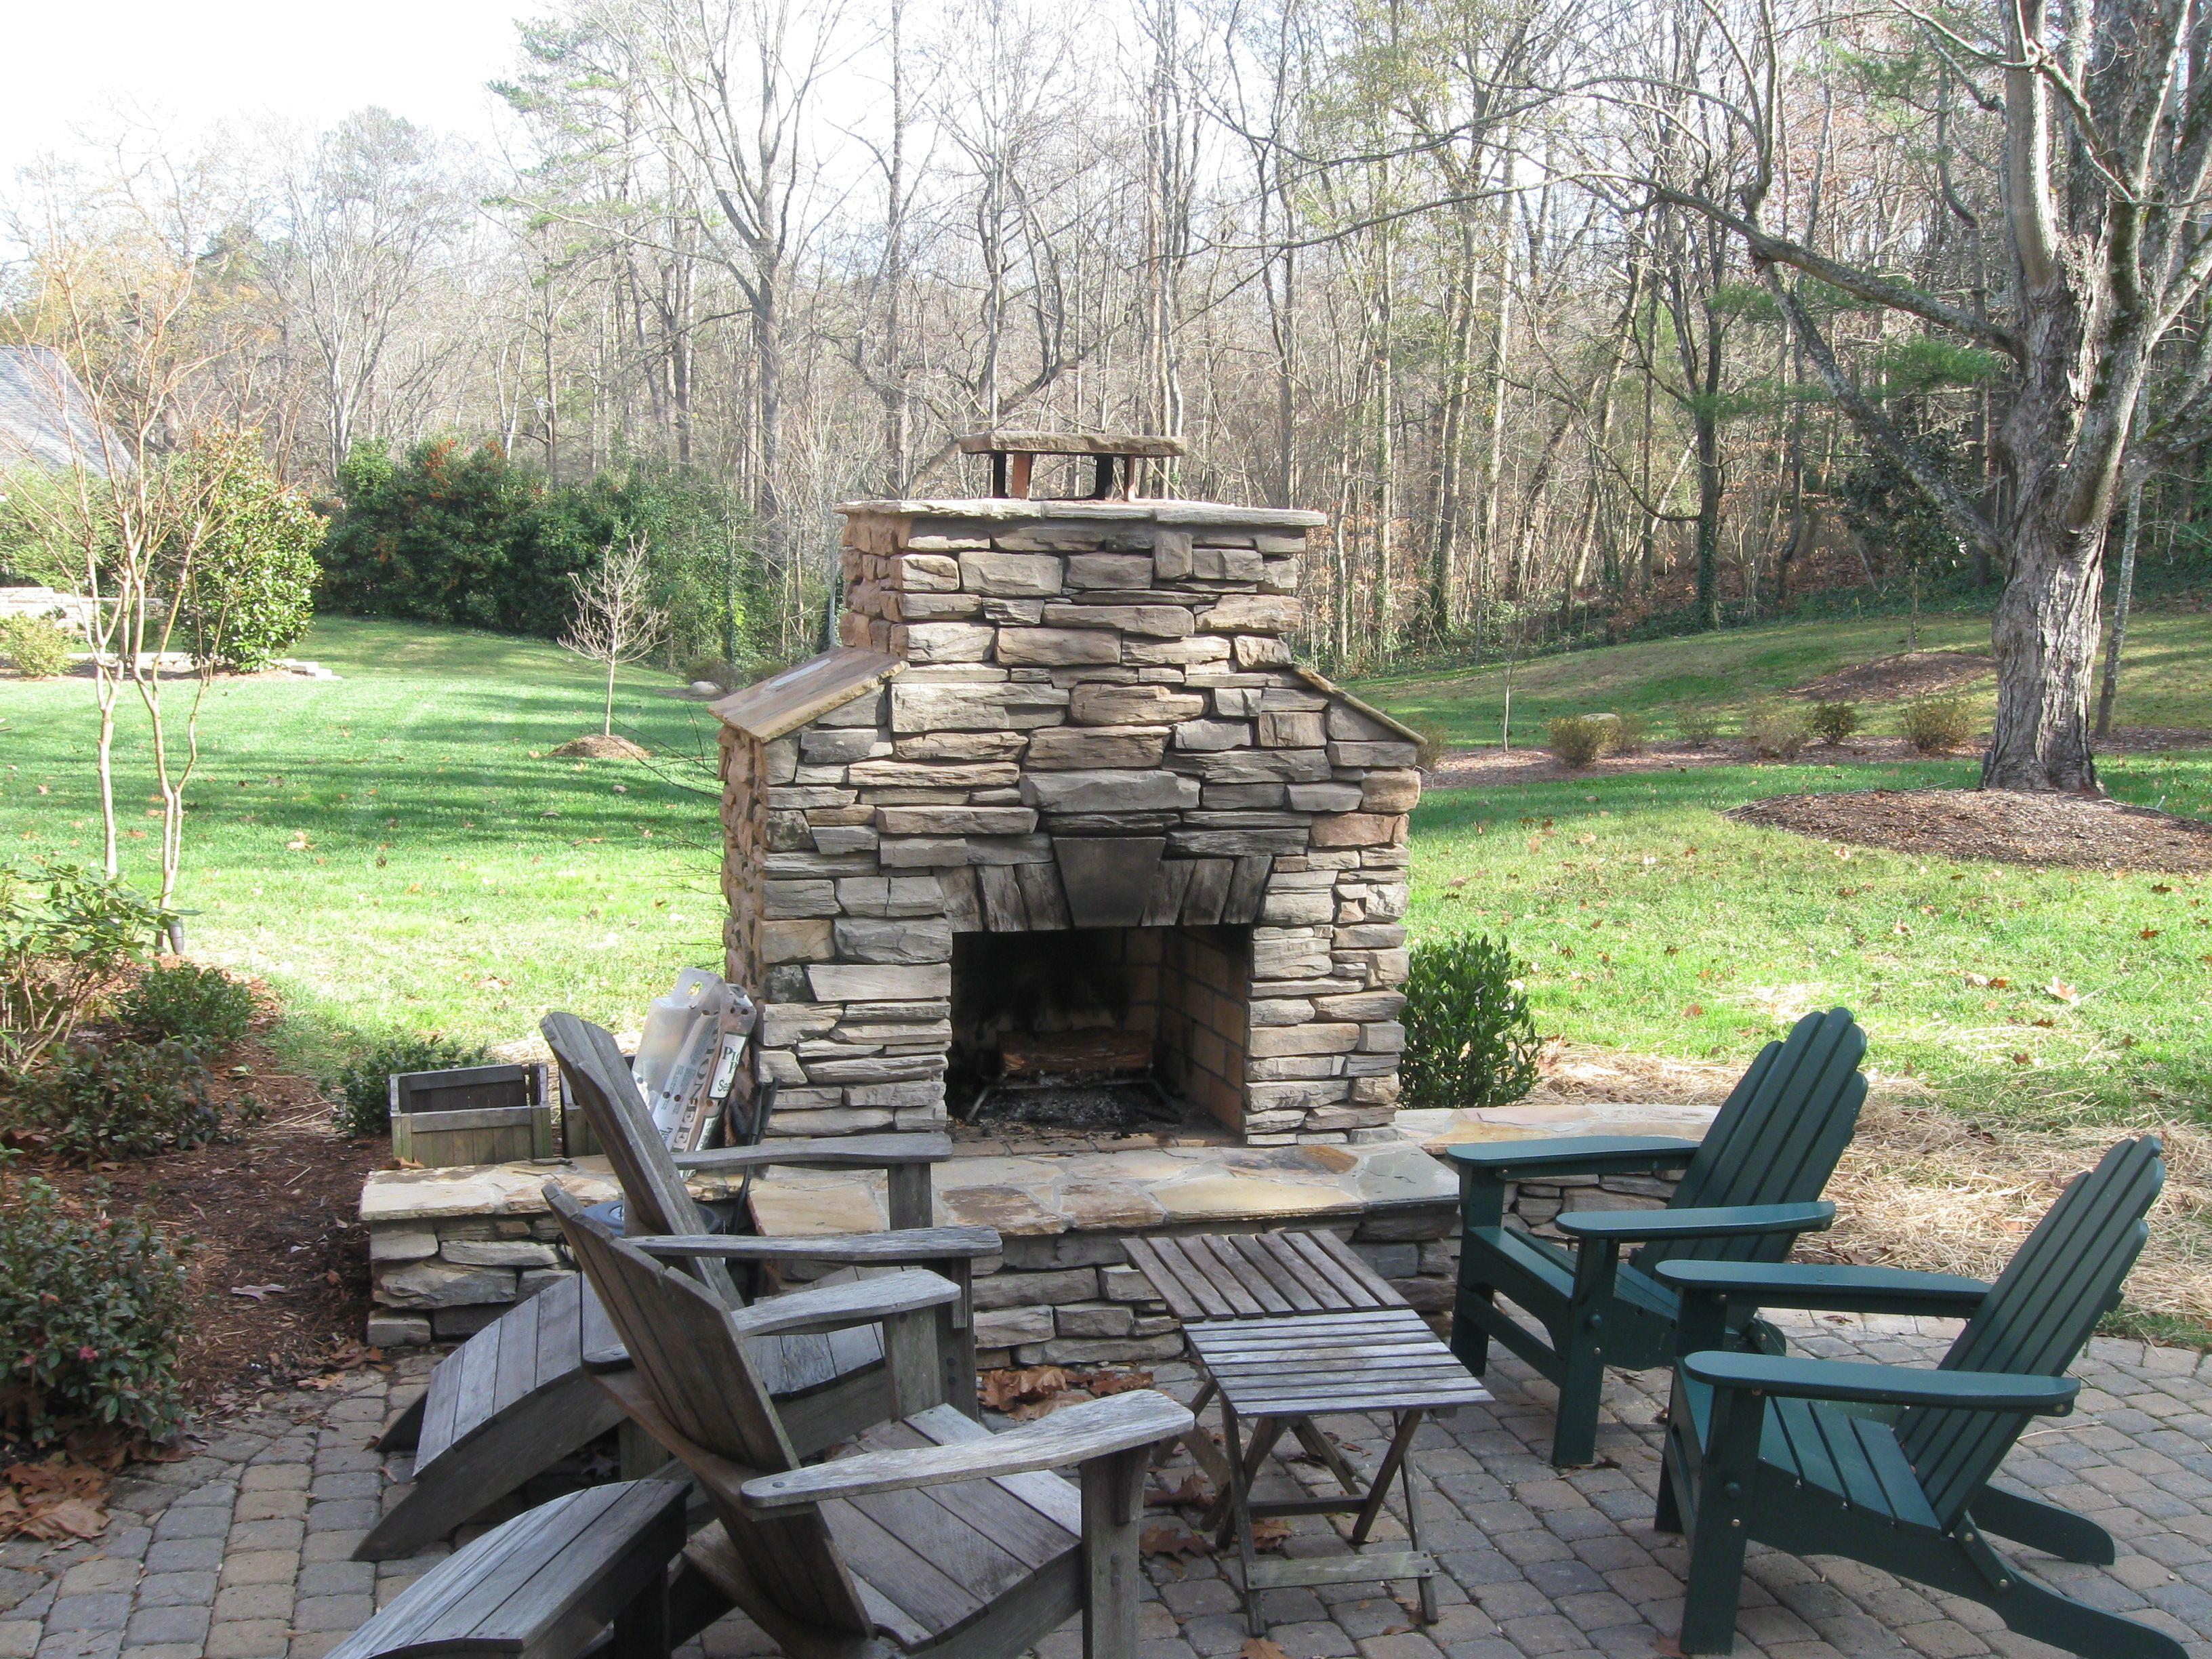 8 Summer Small Patio Ideas For You Outdoor Fireplace Patio Backyard Fireplace Outdoor Fireplace Designs